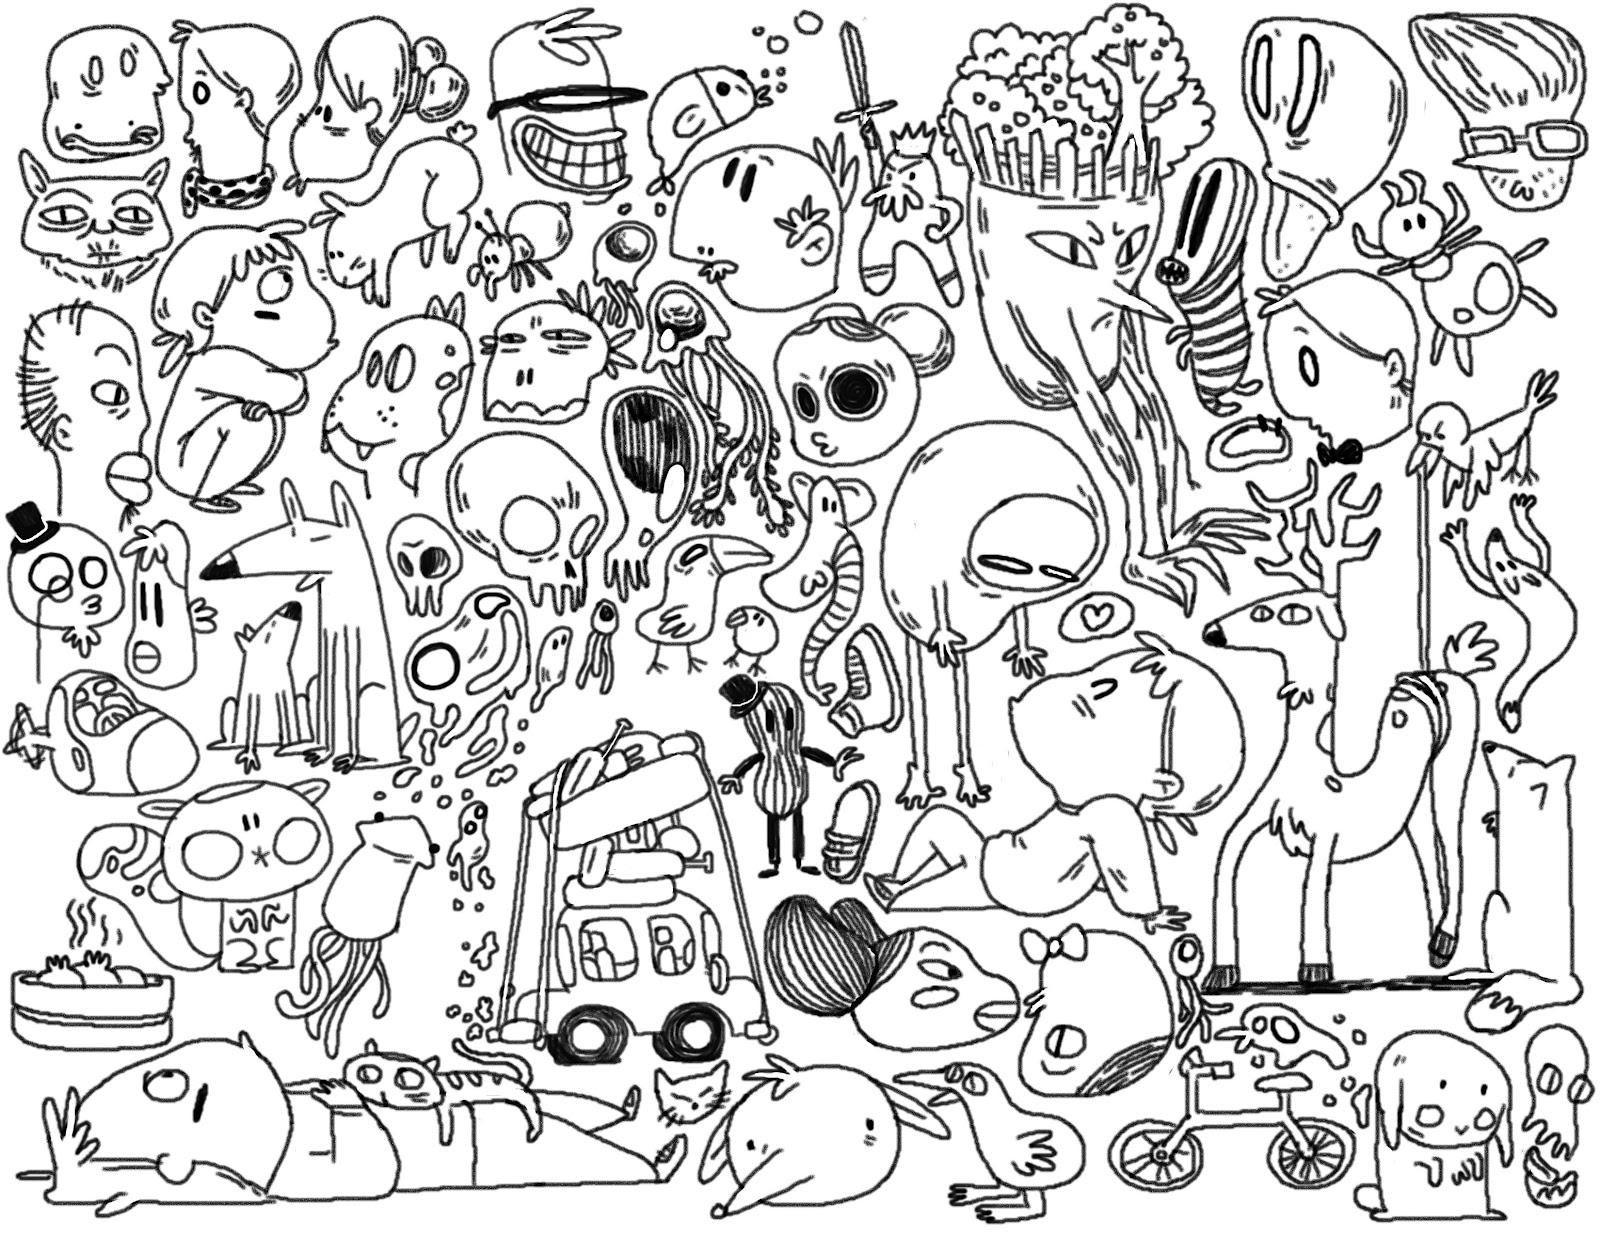 Nooree kim art blog doodle mash for Printable doodle art coloring pages